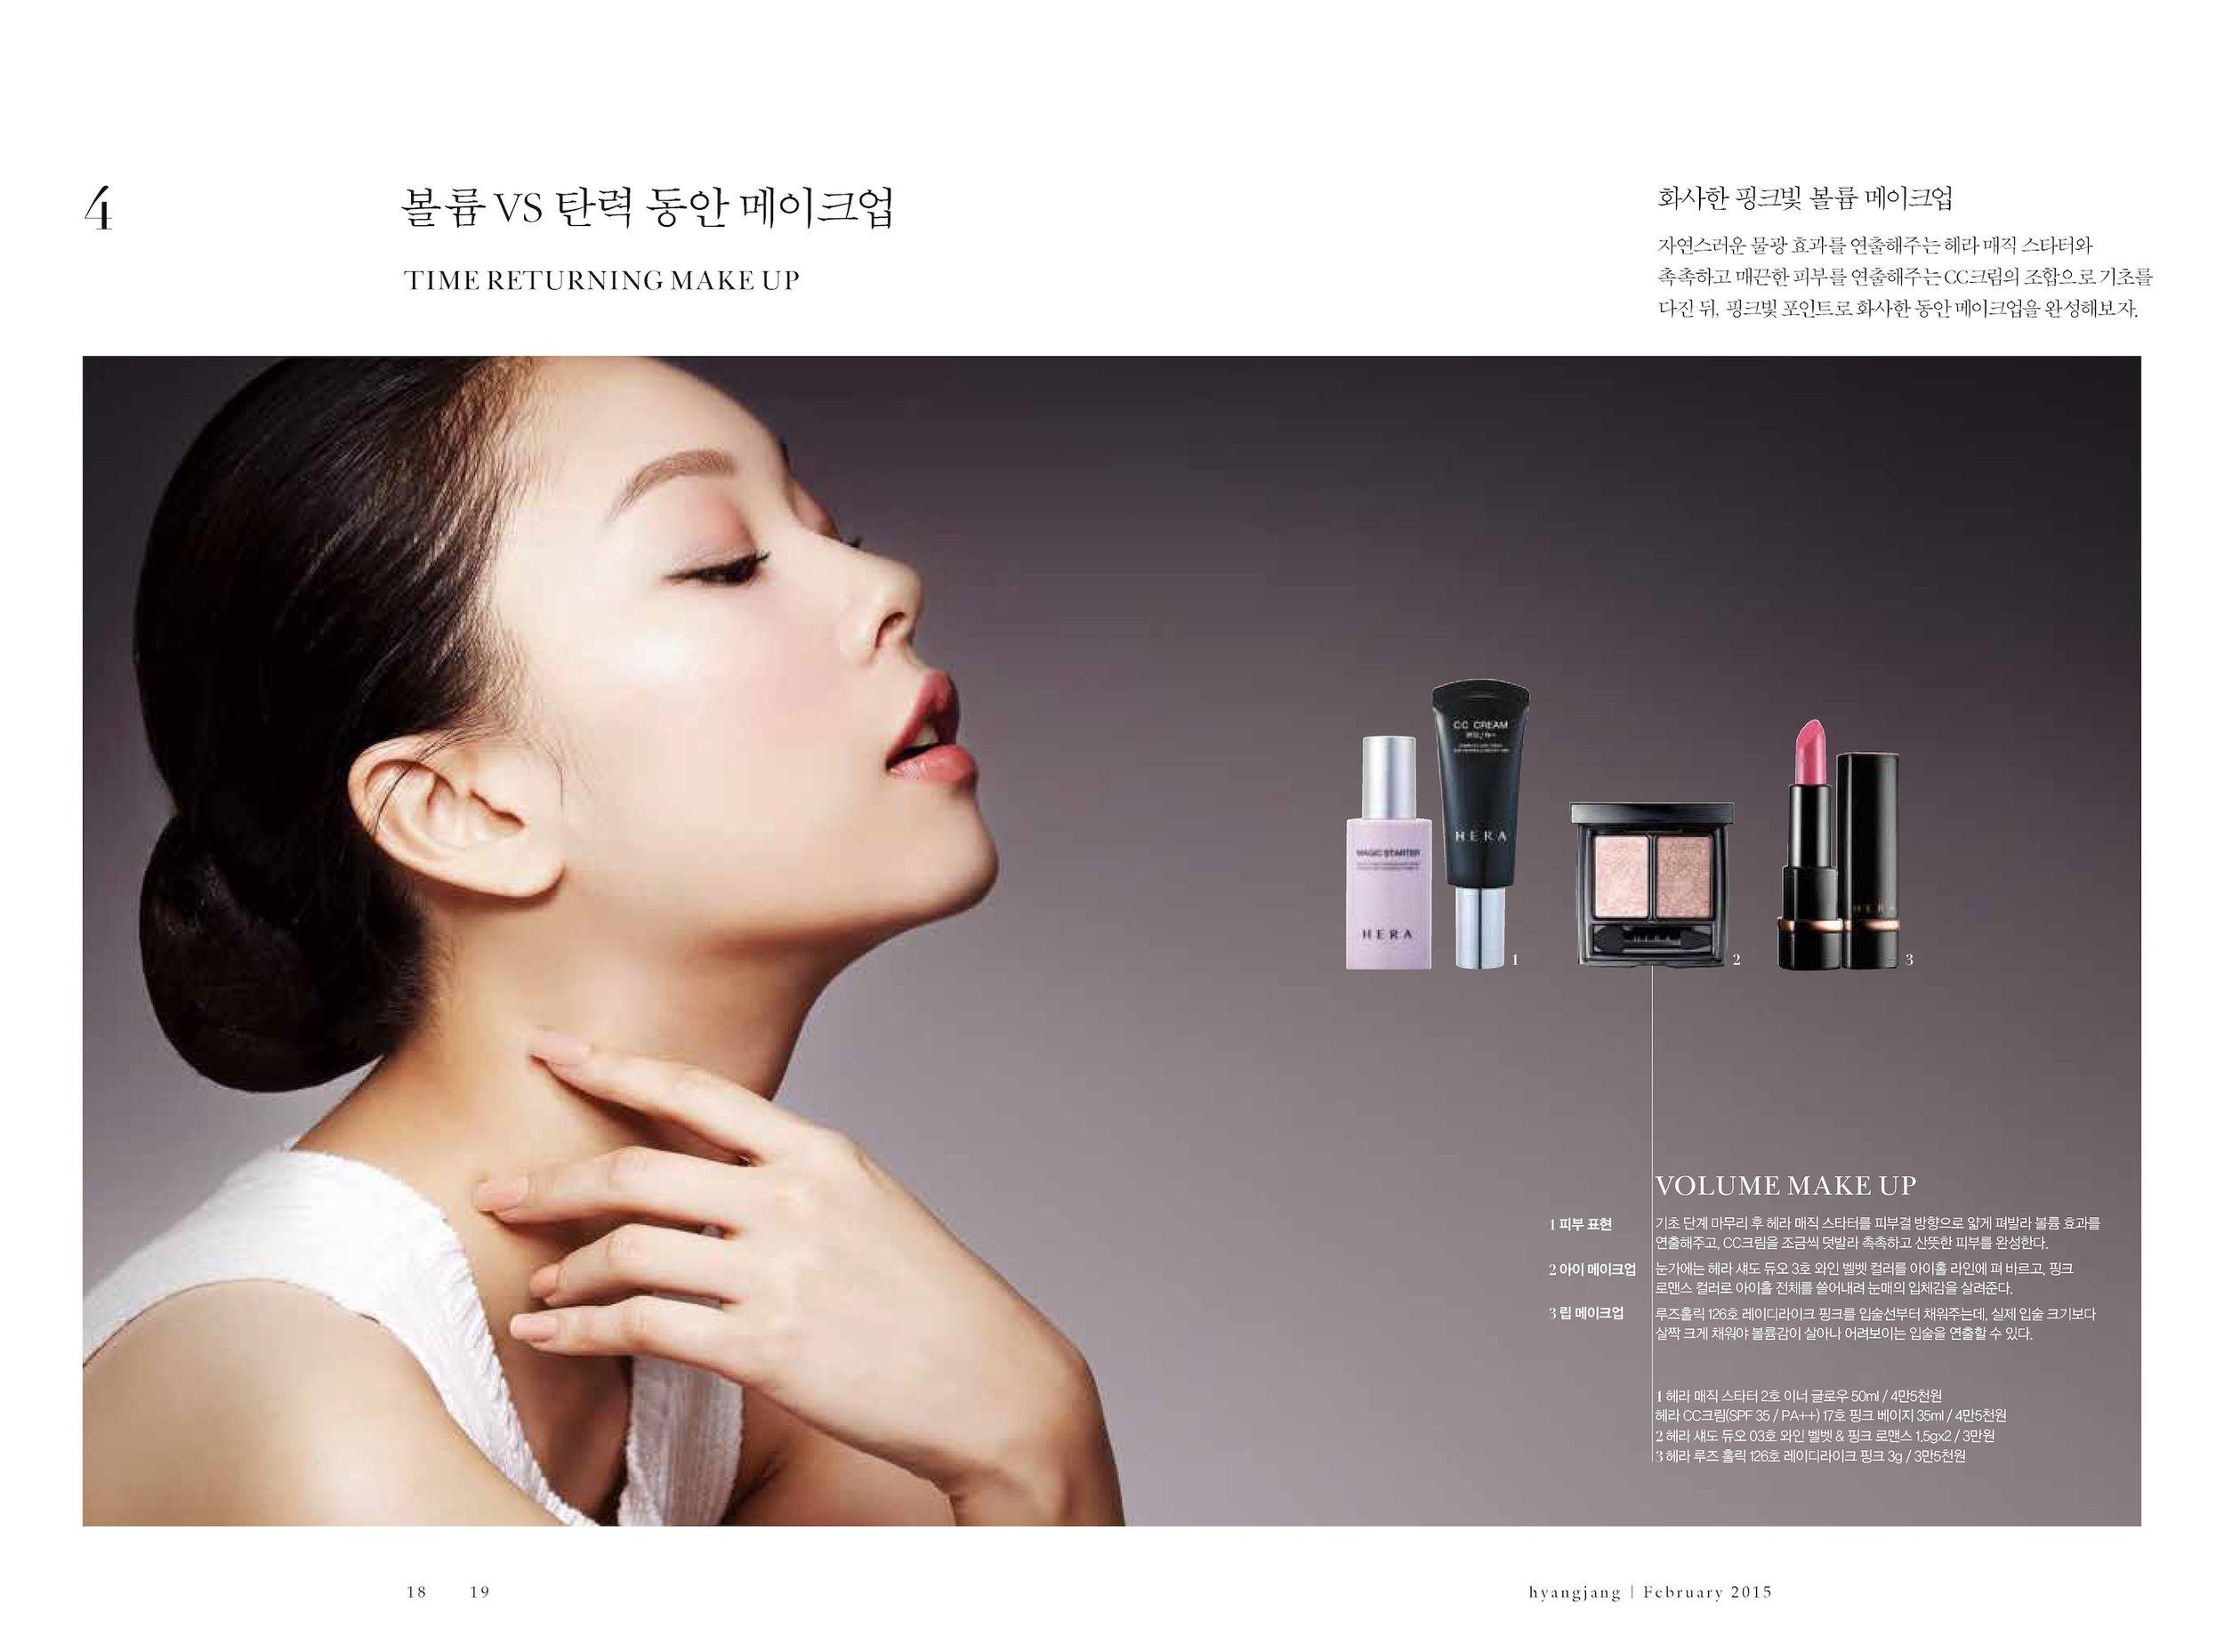 hyangjang-201502_페이지_10.jpeg